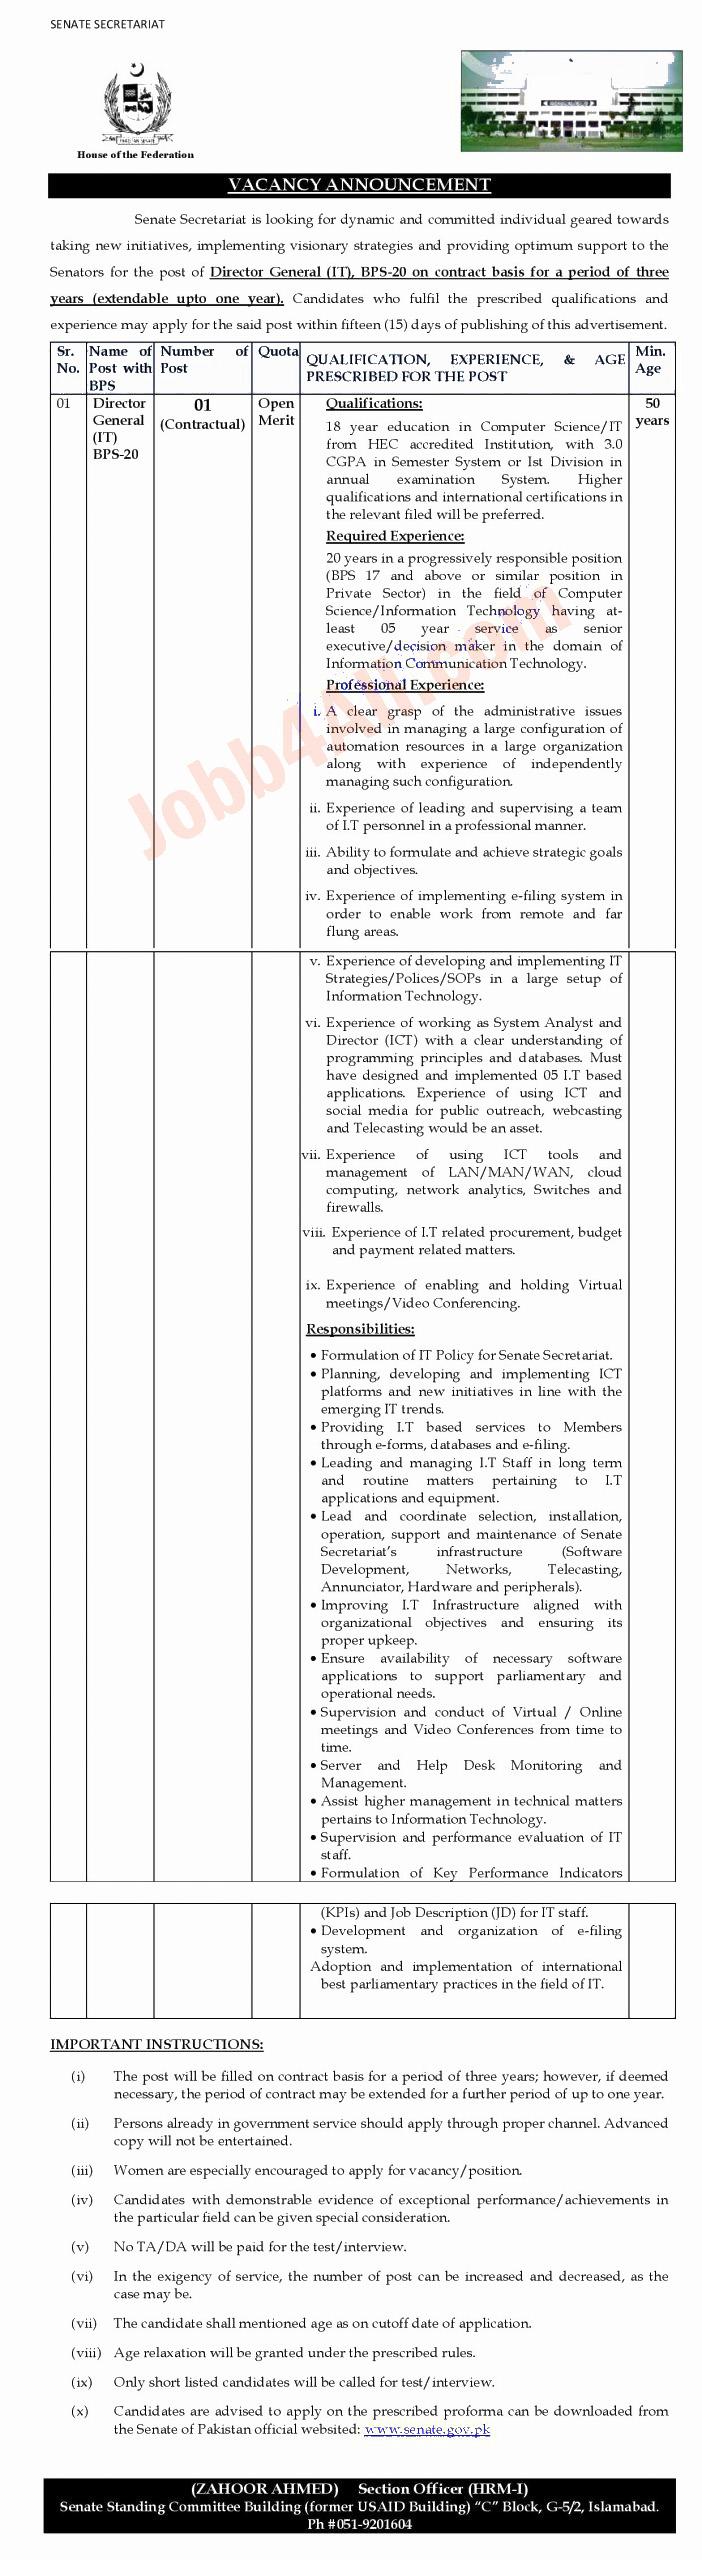 Senate of Pakistan Jobs 2021 - Application Performa  www.senate.gov.pk